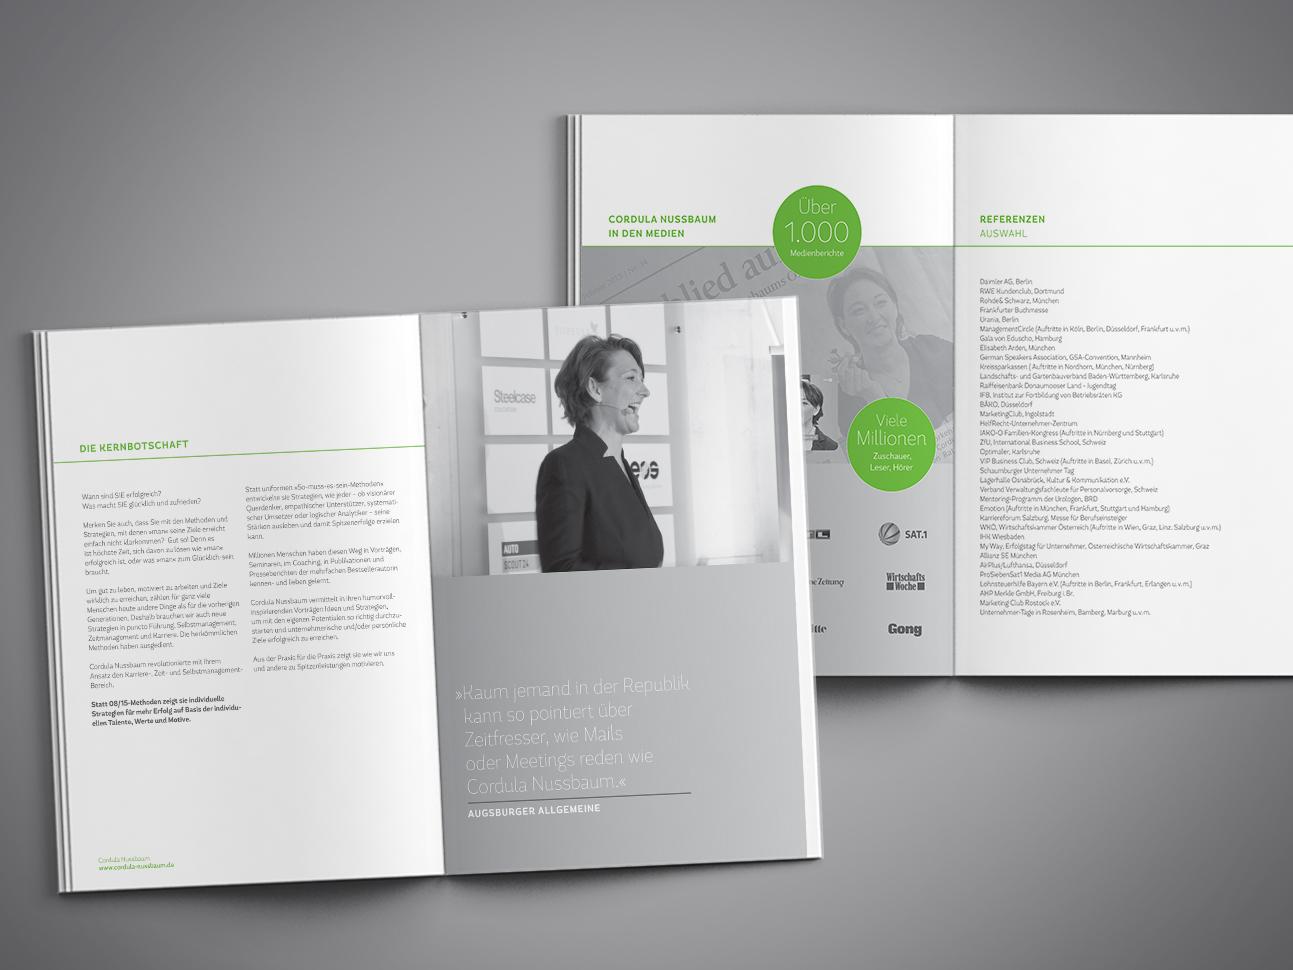 martin_zech_design_corporate_design_cordula_nussbaum_speaker-profil_doppelseiten